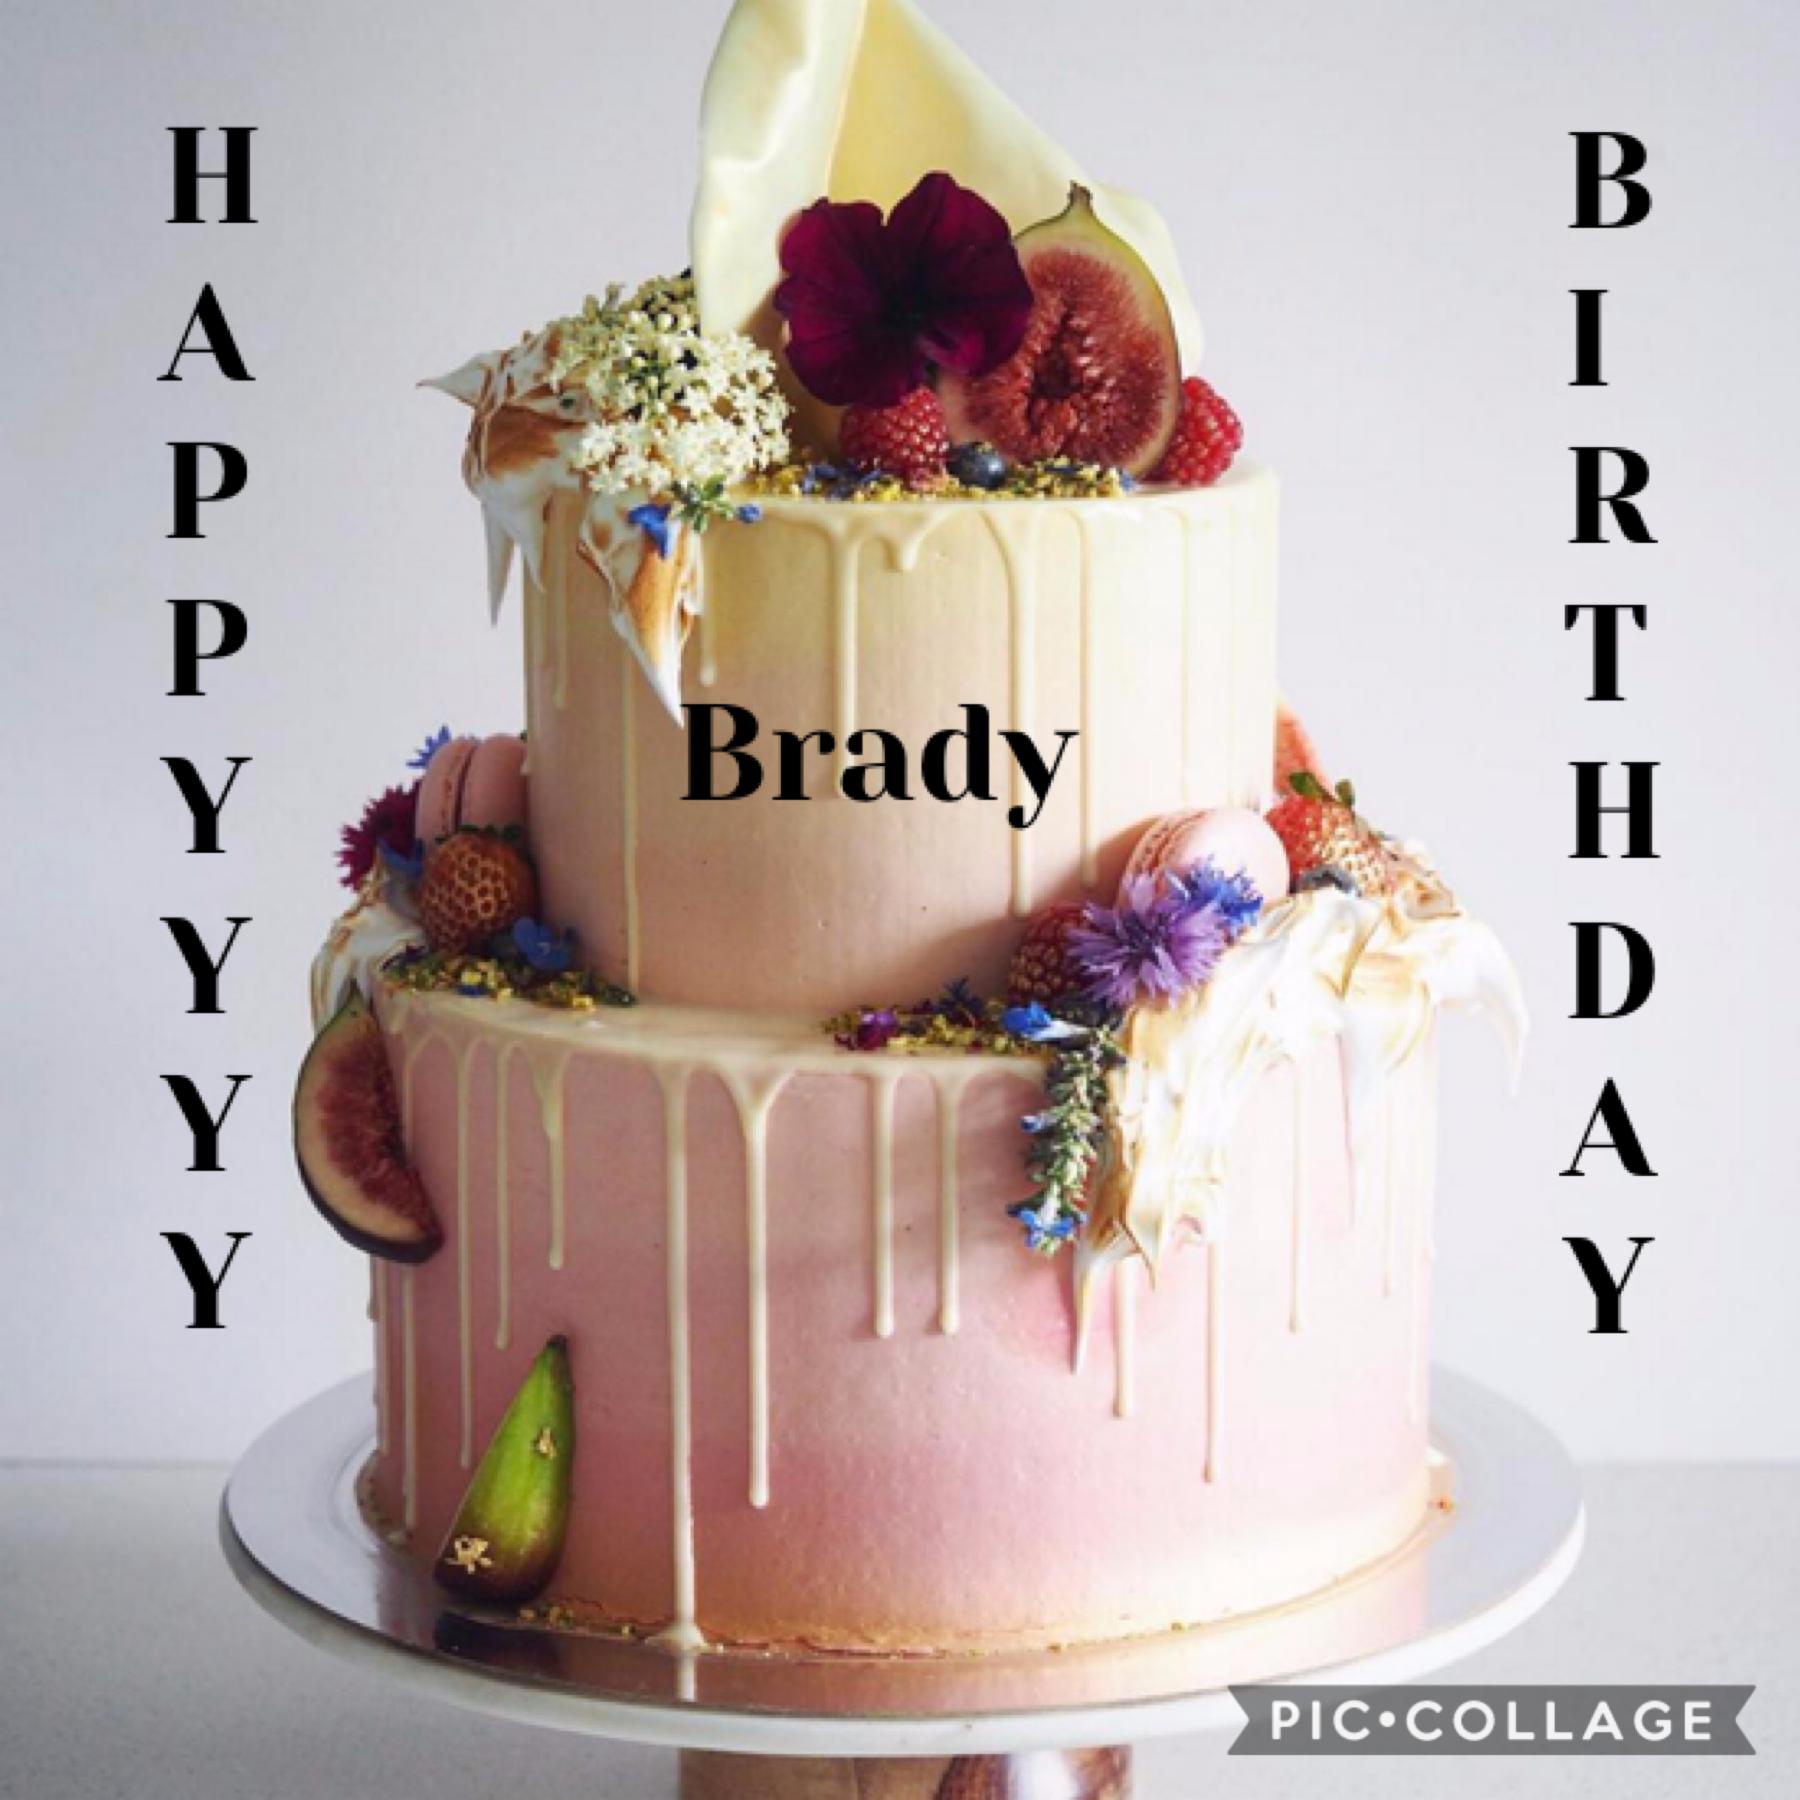 Happy birthday Brady!! Look at all that fruit!